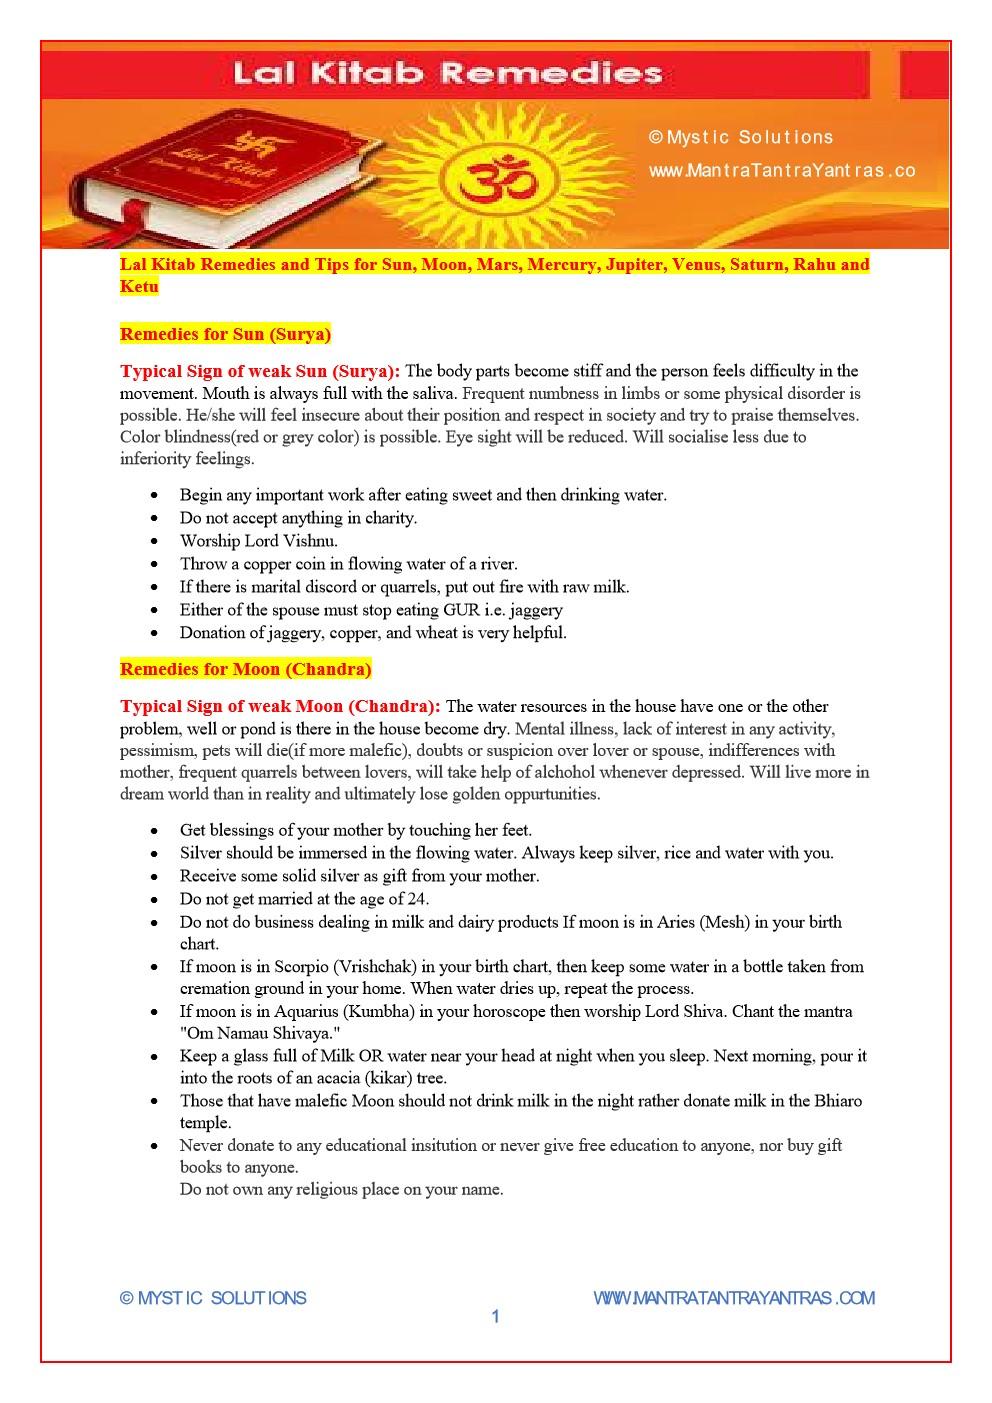 Lal kitab mystic solutions blog 1 nvjuhfo Gallery